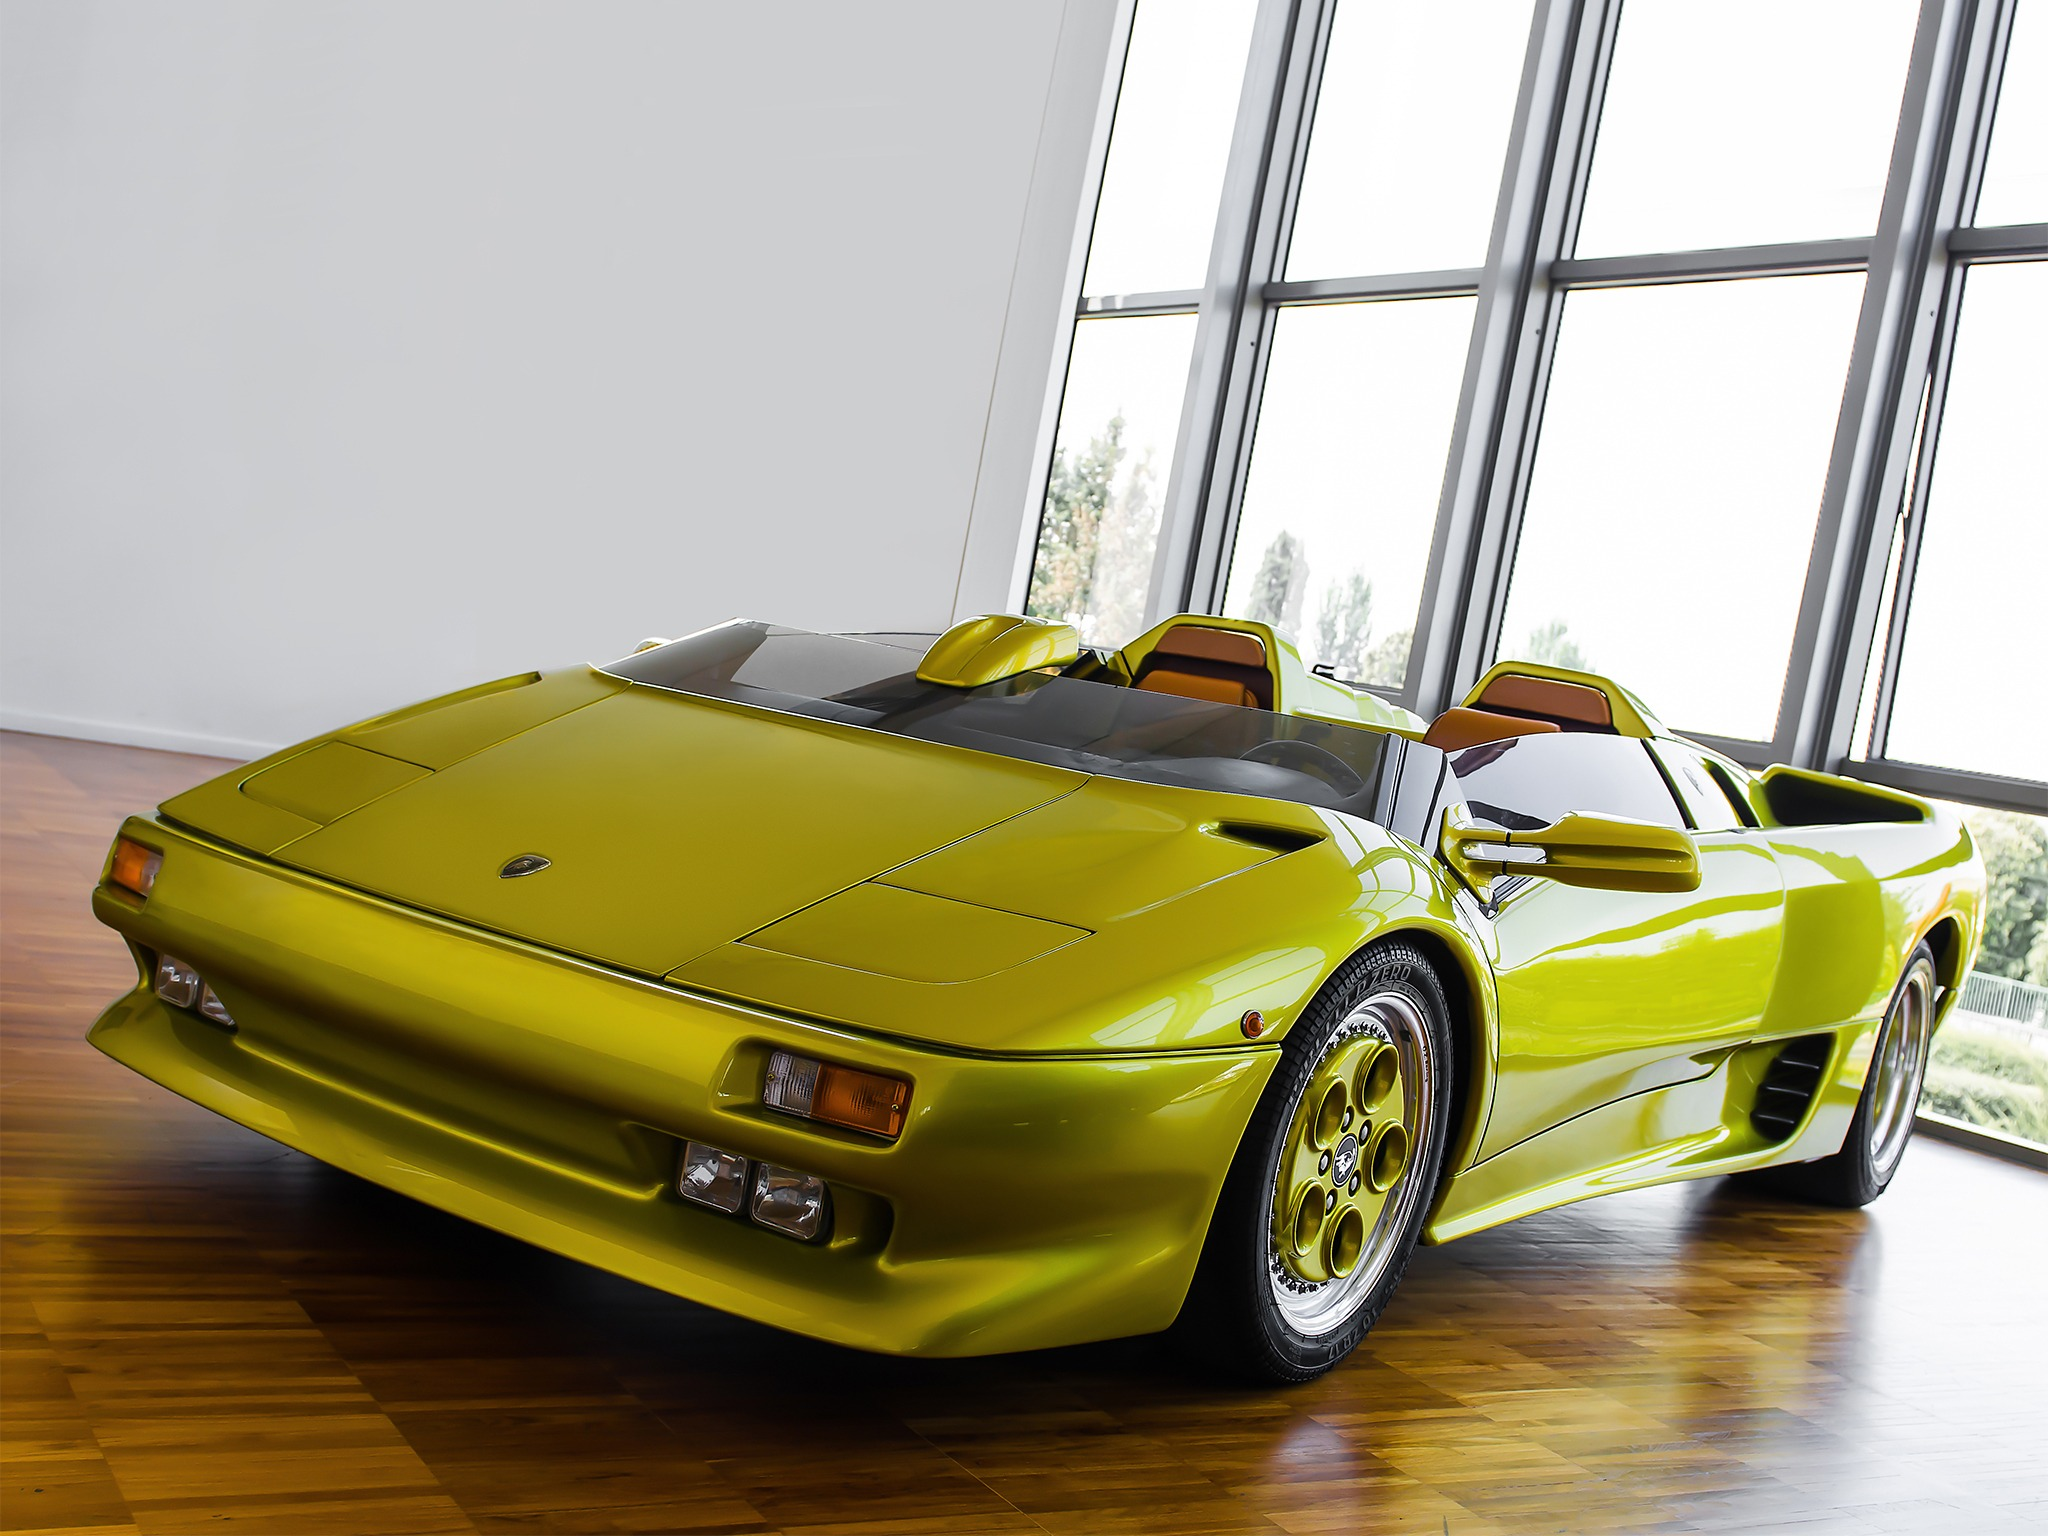 Lamborghini Diablo Roadster Prototype 1992 Old Concept